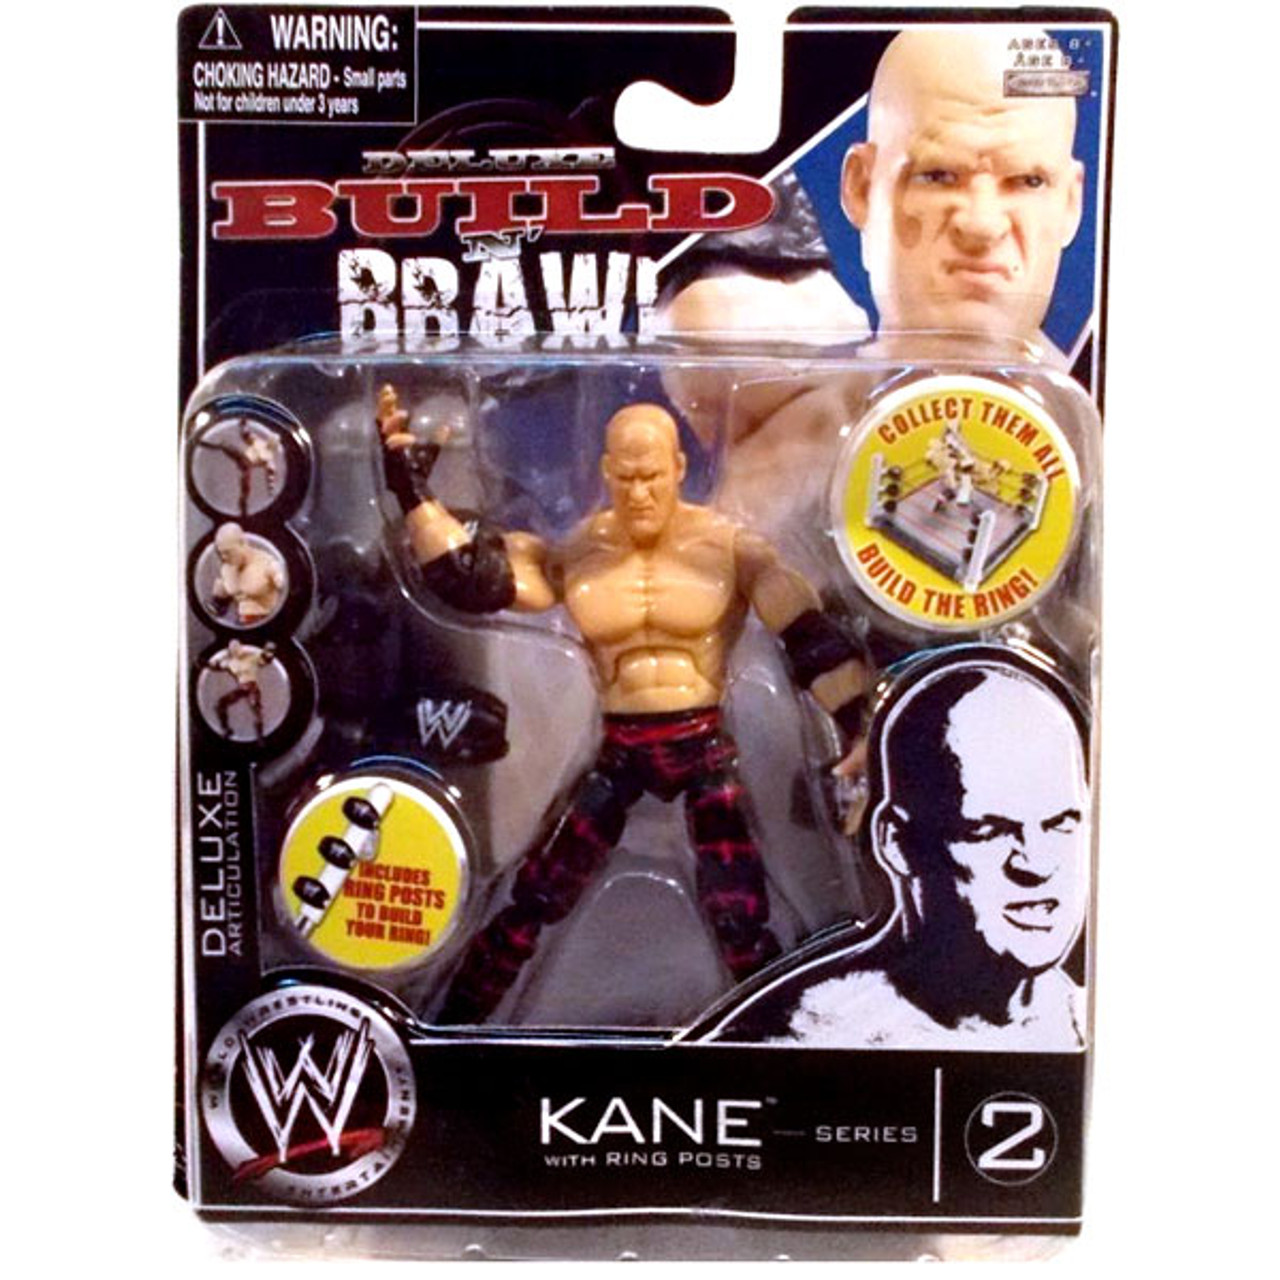 WWE Wrestling Build N' Brawl Series 2 Kane Action Figure